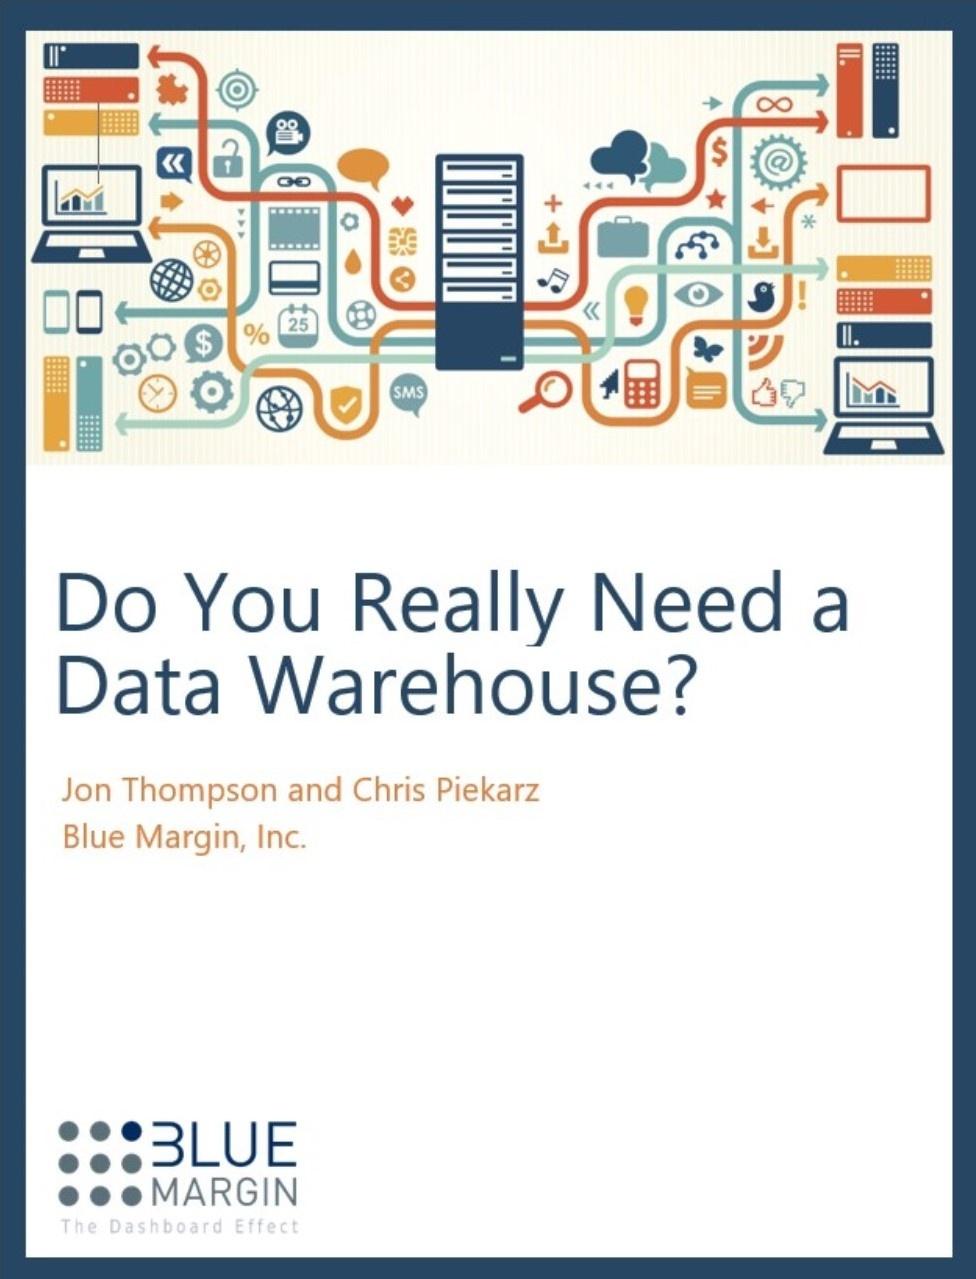 Do You Really Need a Data Warehouse.jpg